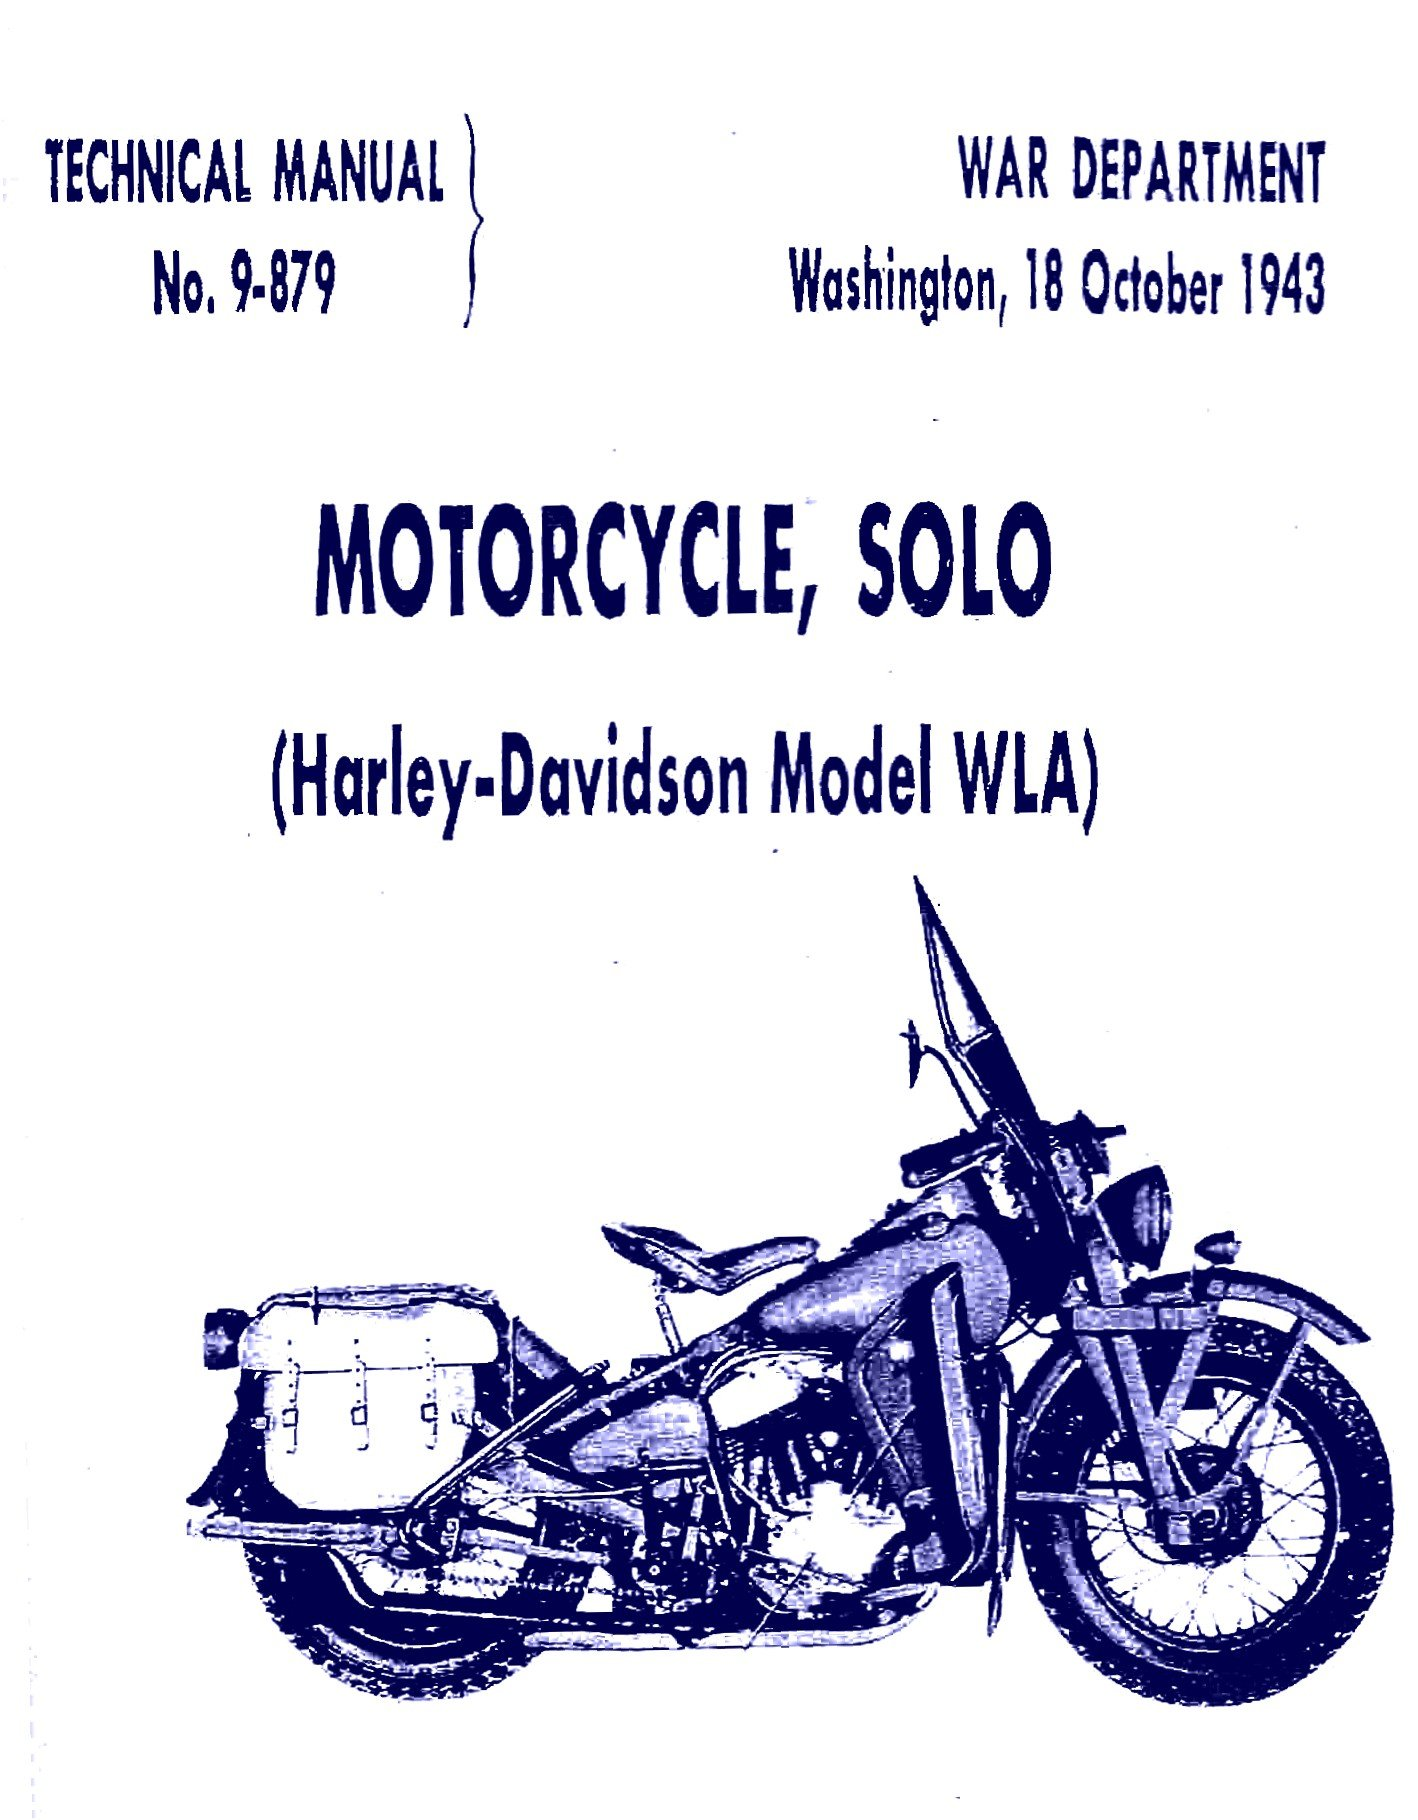 Motorcycle, Solo (Harley Davidson Model WLA)